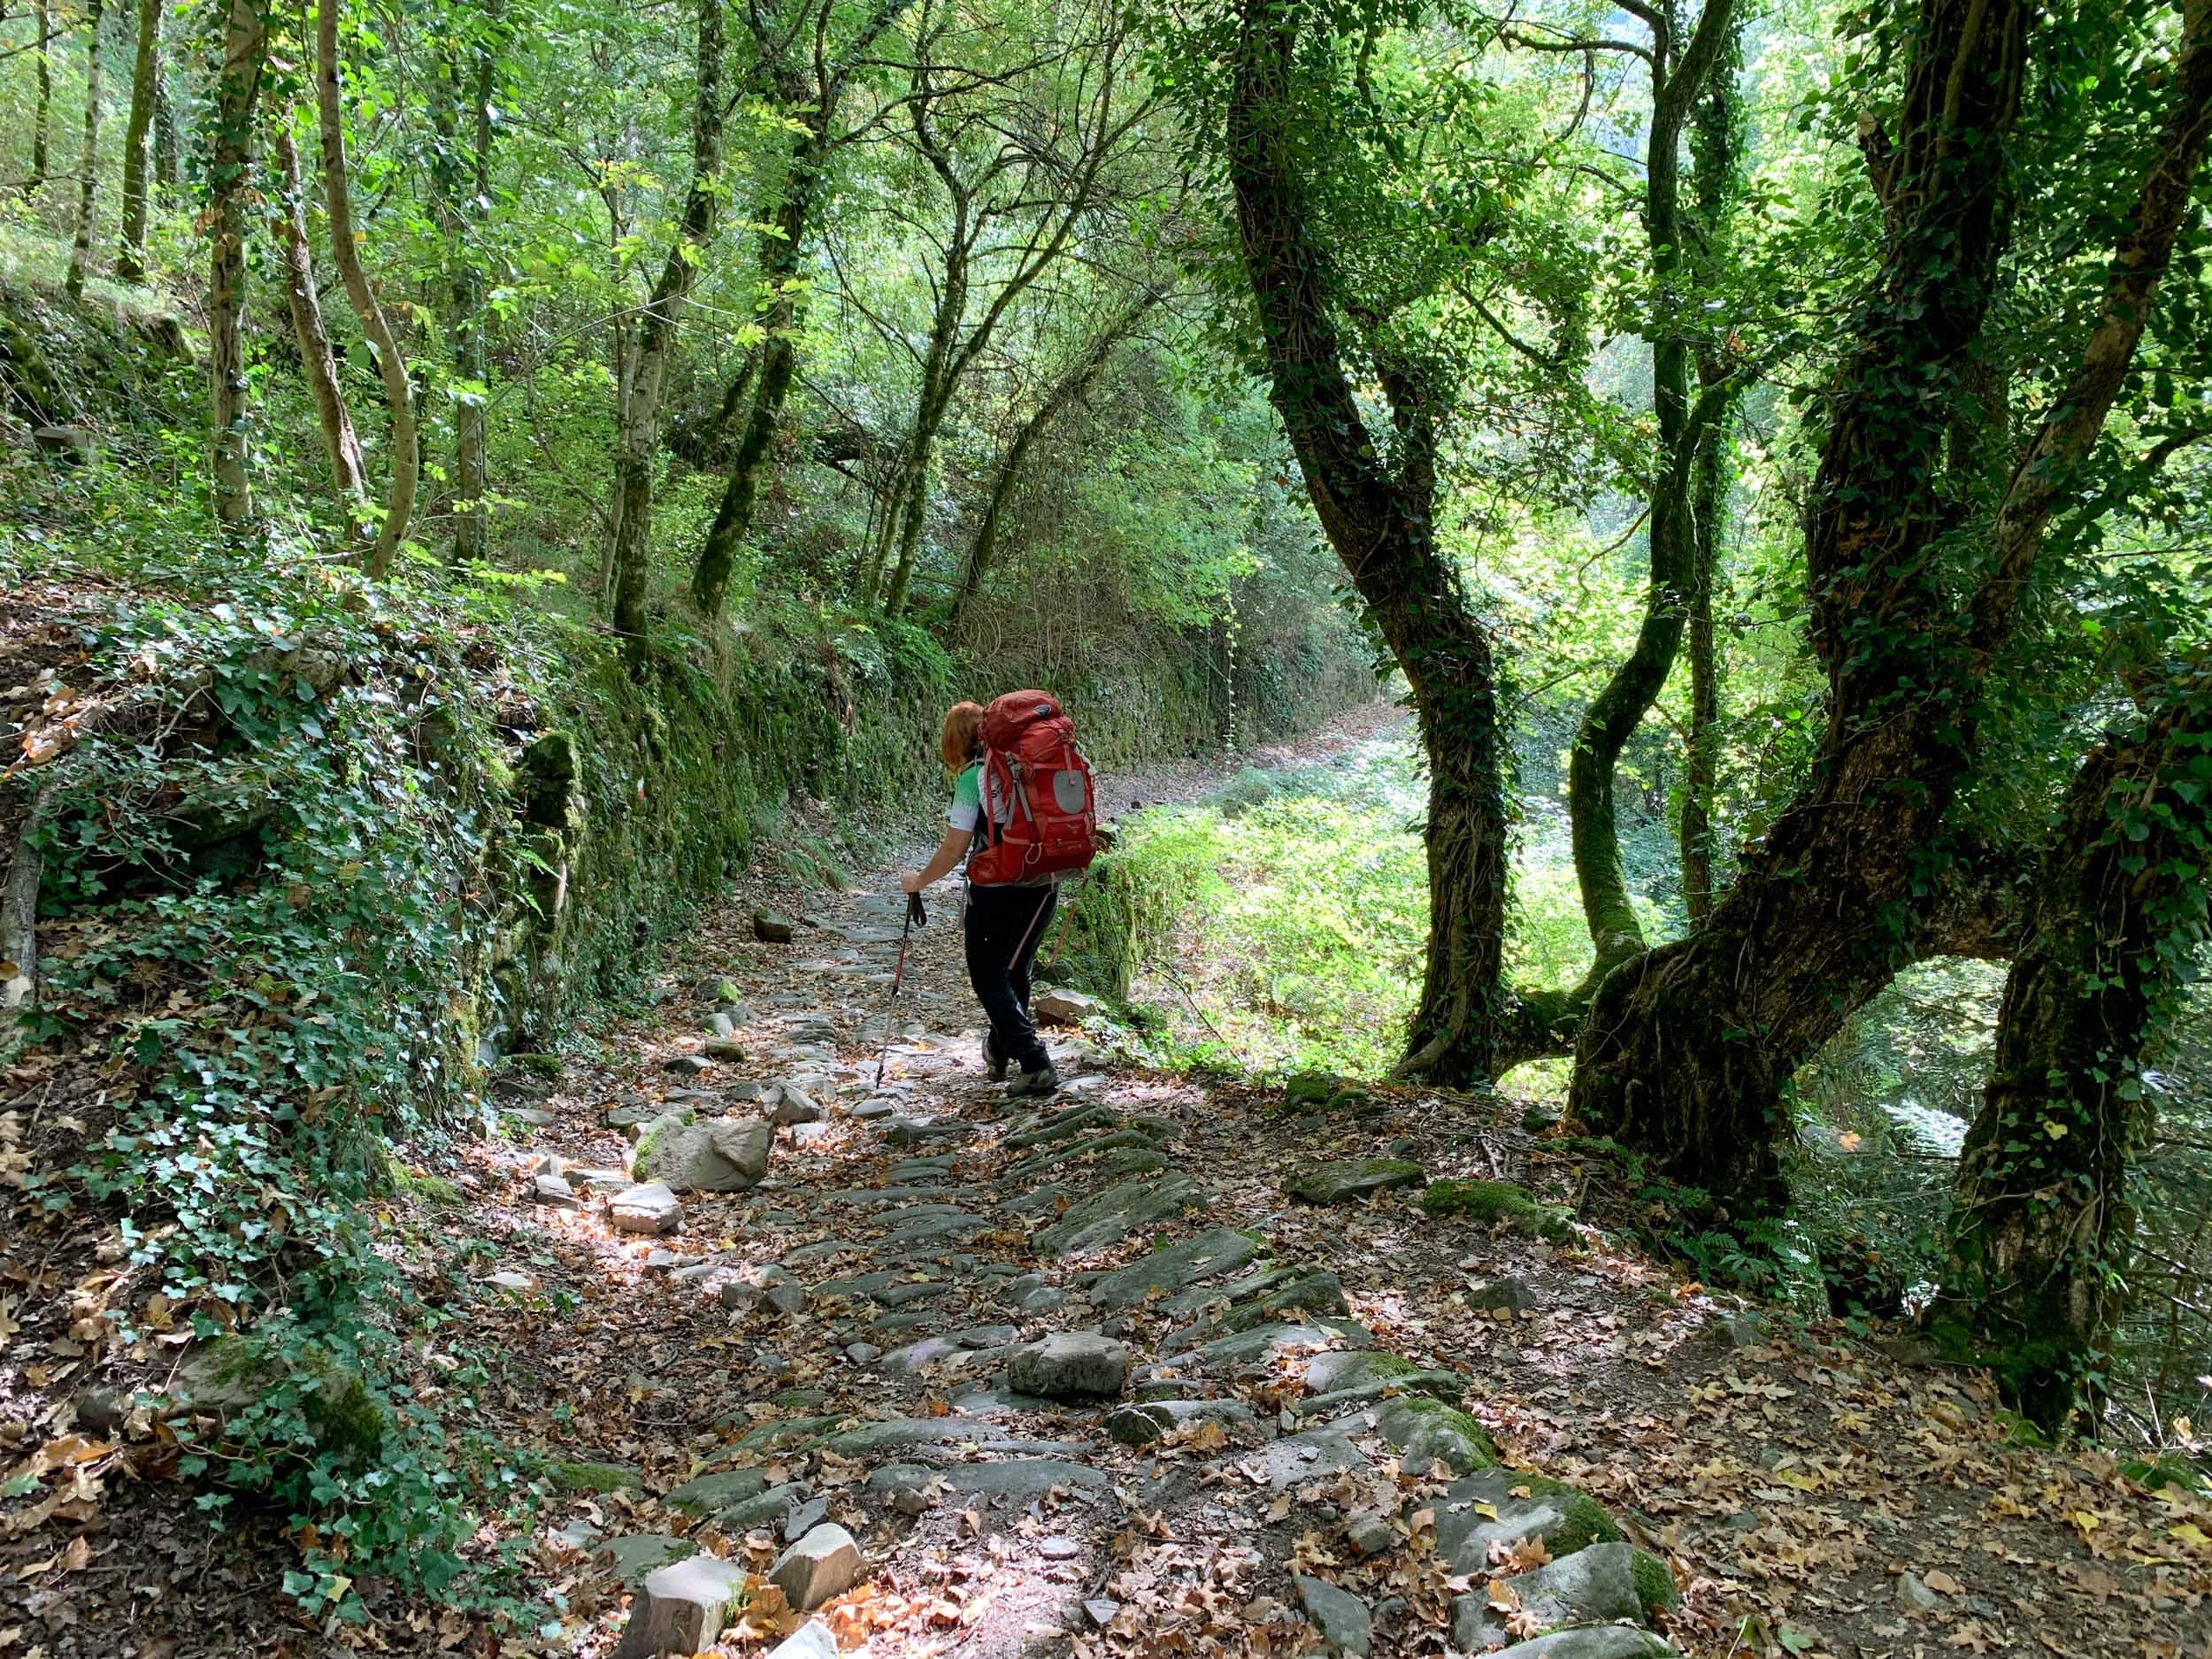 The Via Francigena in northern Tuscany